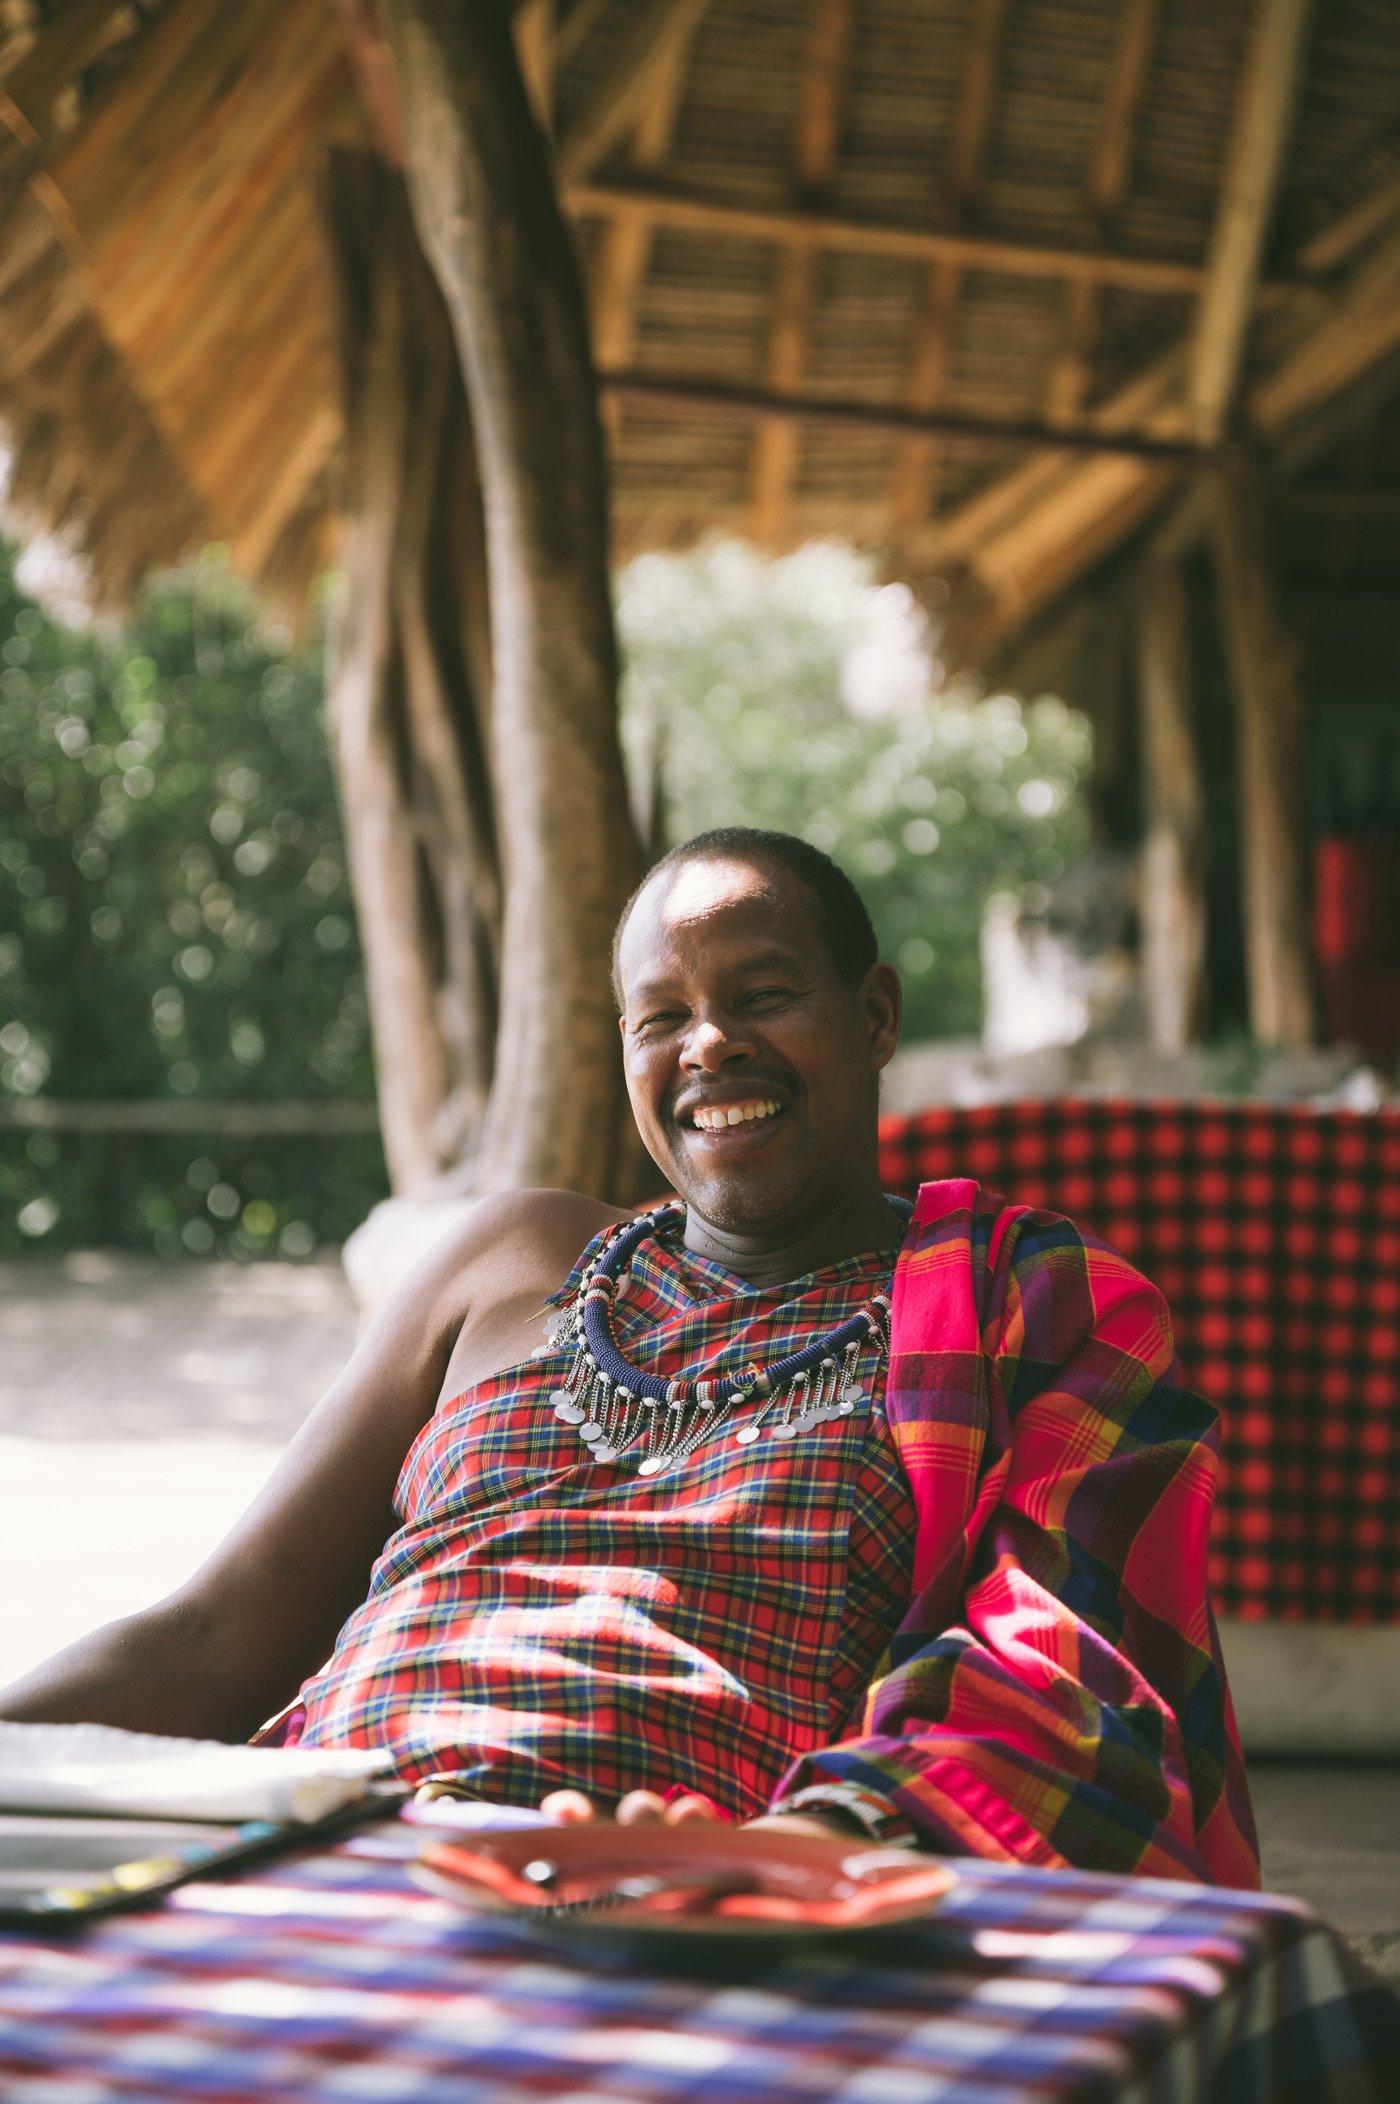 Jackson Looseyia of the Tangulia Mara Camp in the Maasai Mara in Kenya